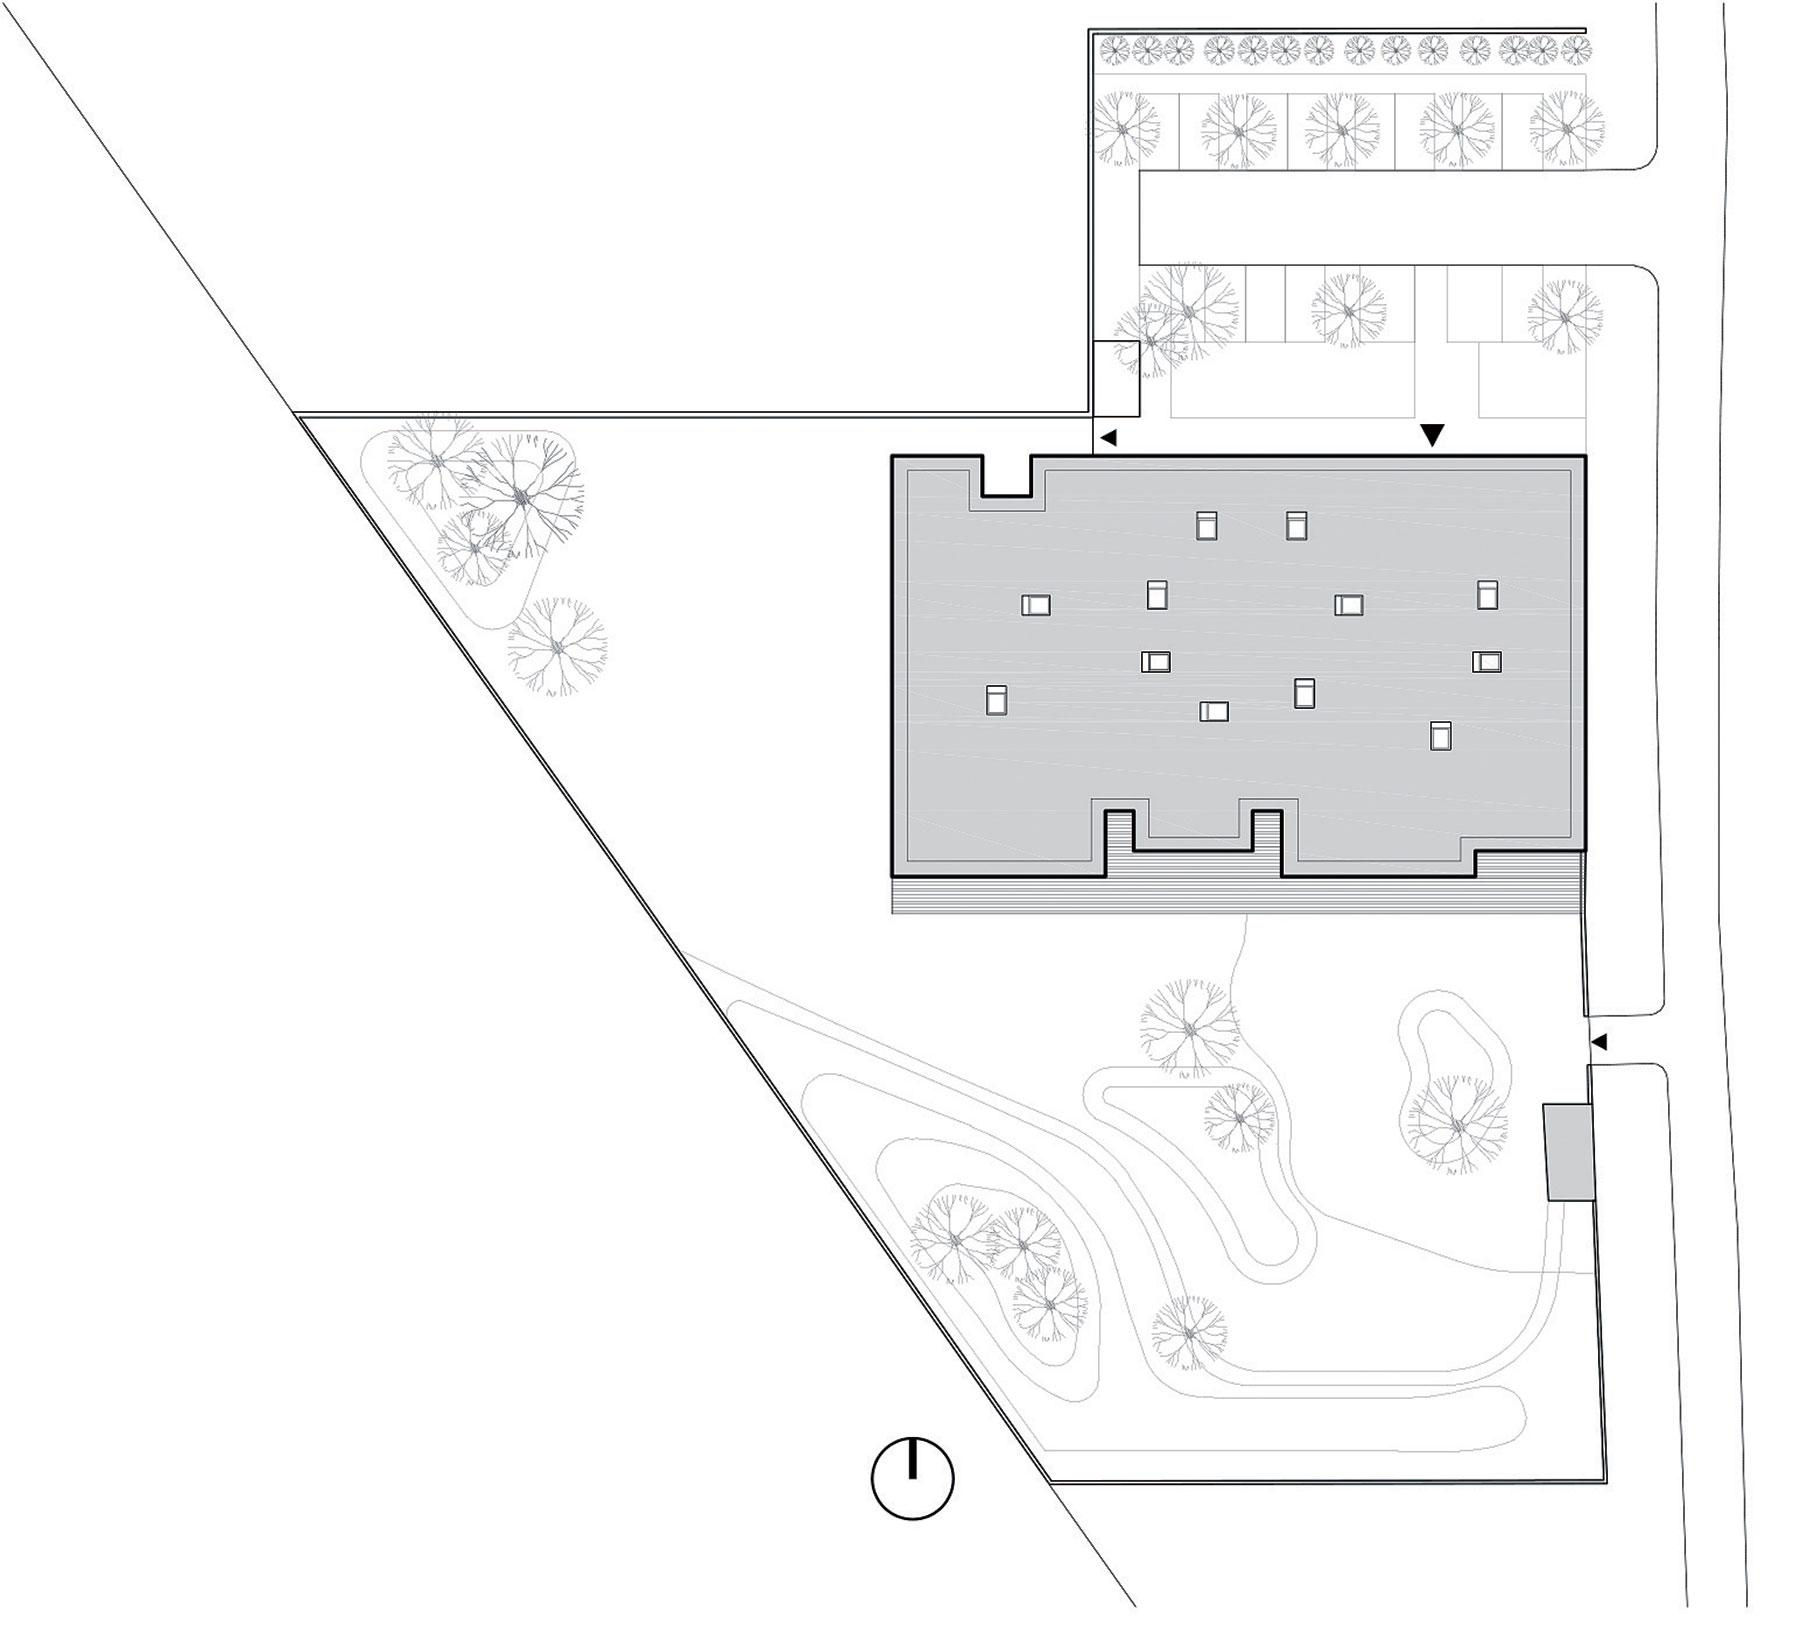 06 R600 009 site plan